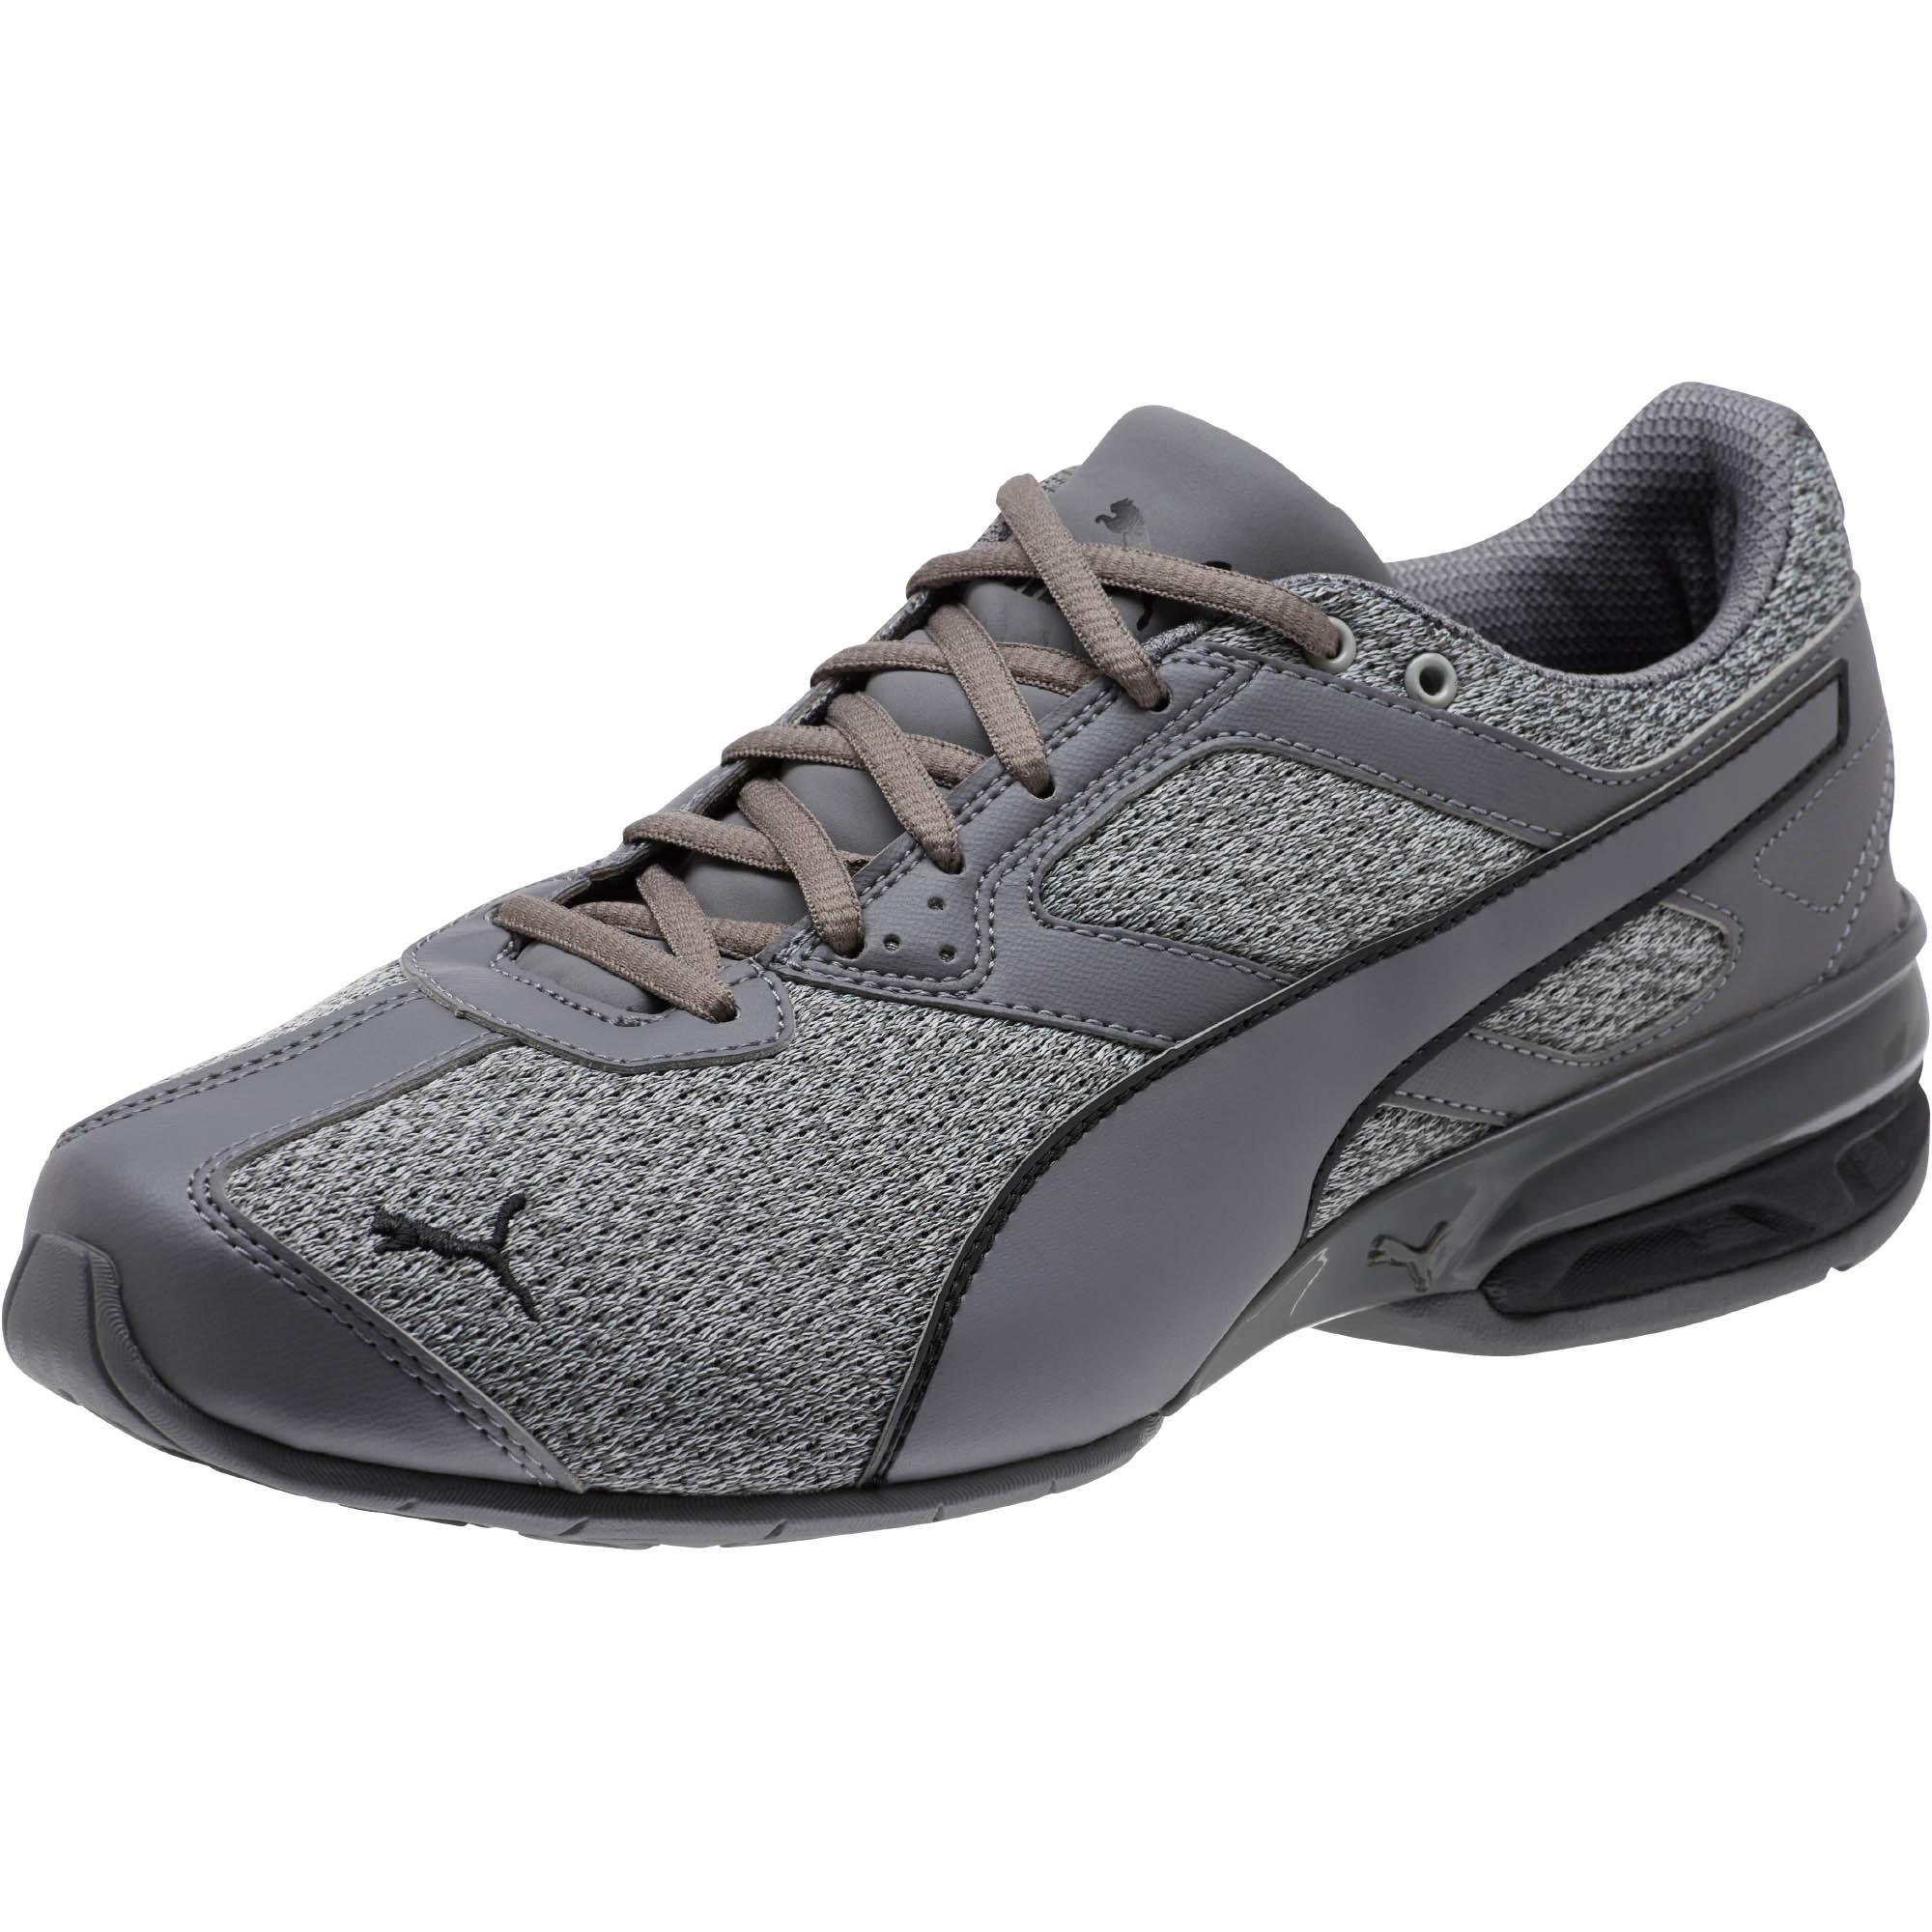 Puma Sale: Carson 2 Shoes or Smash v2 Shoes $27, Redon Move